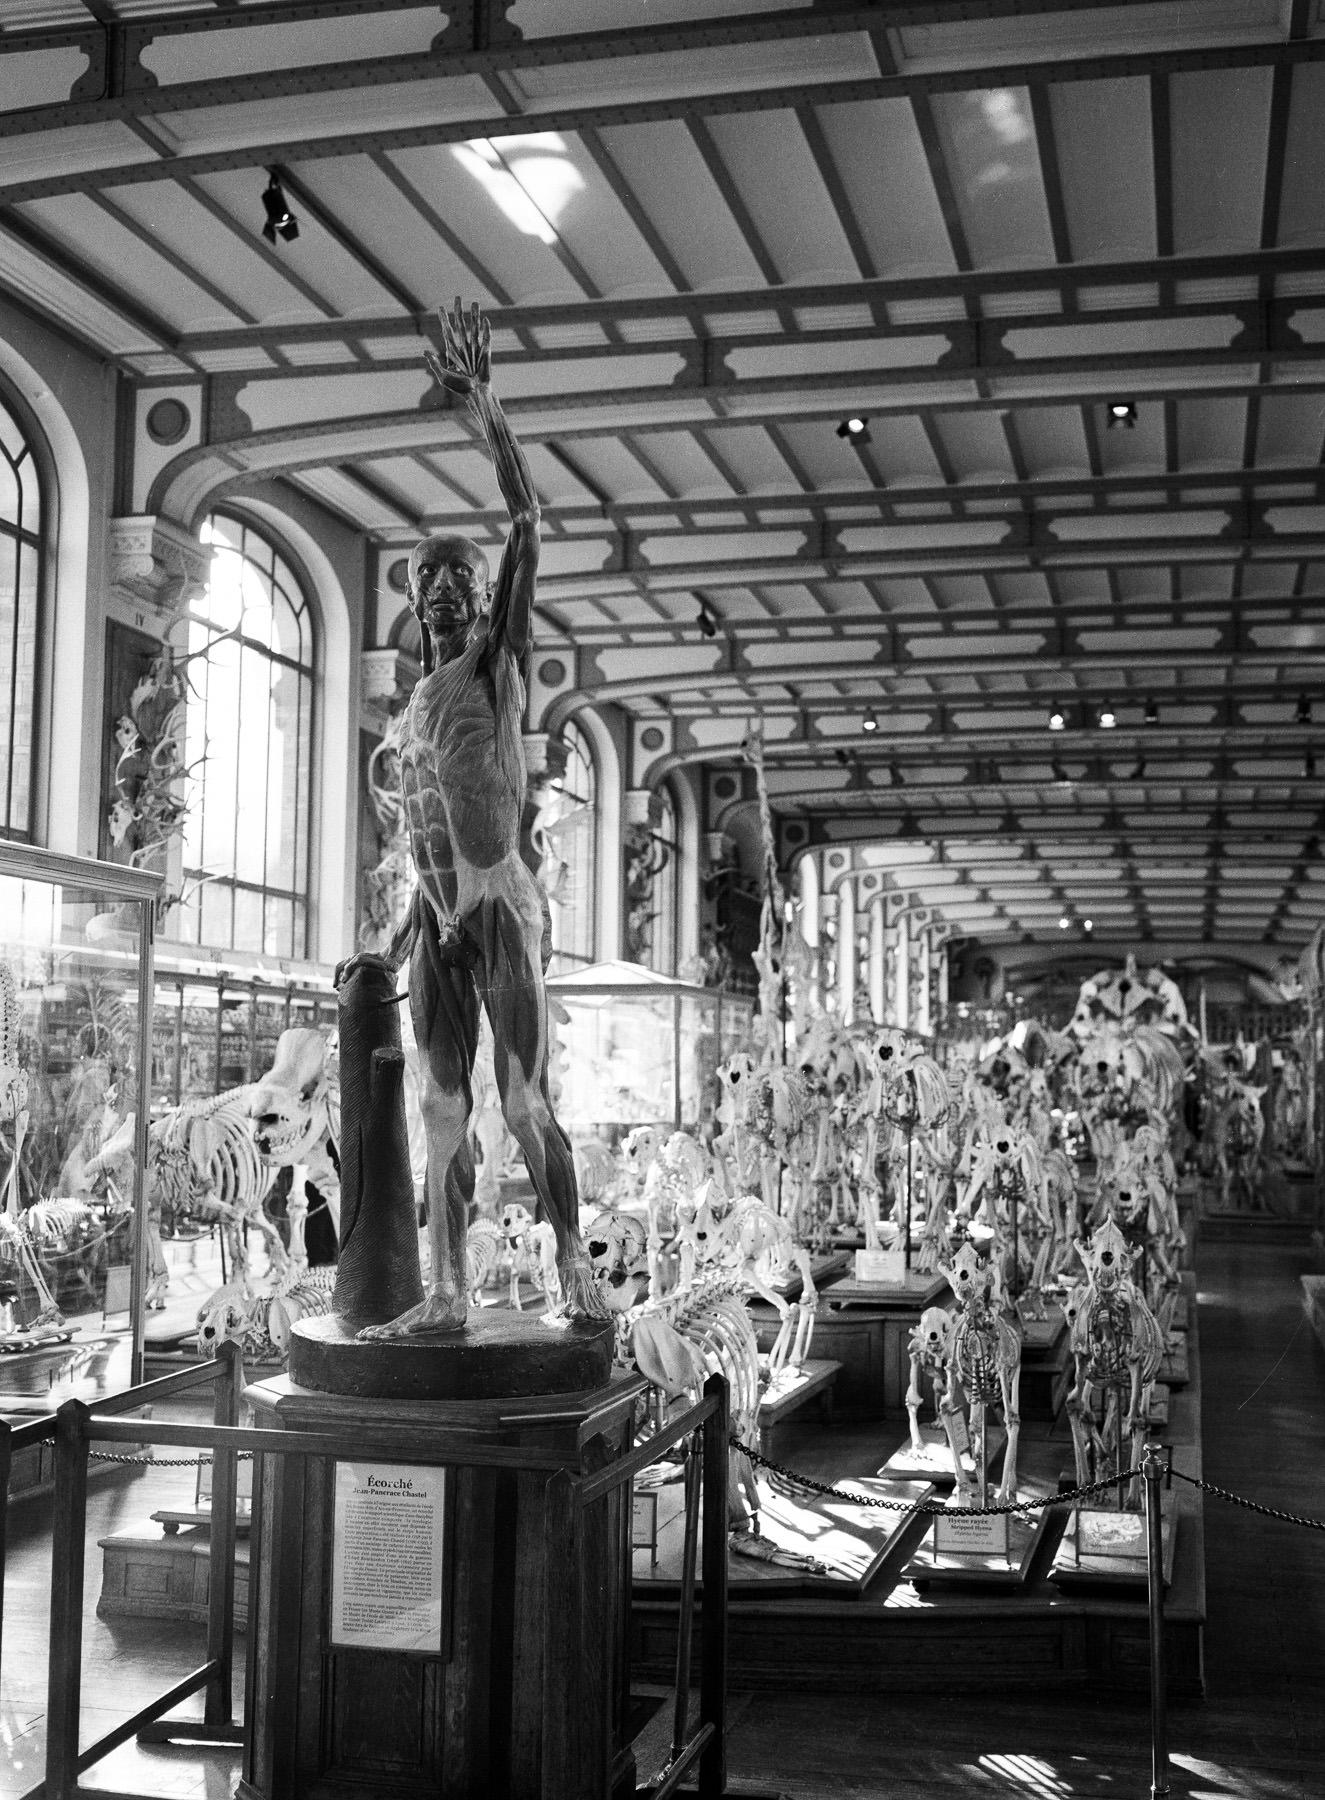 Galerie d'Anatomie Comparée, Ilford HP5 + GA 645